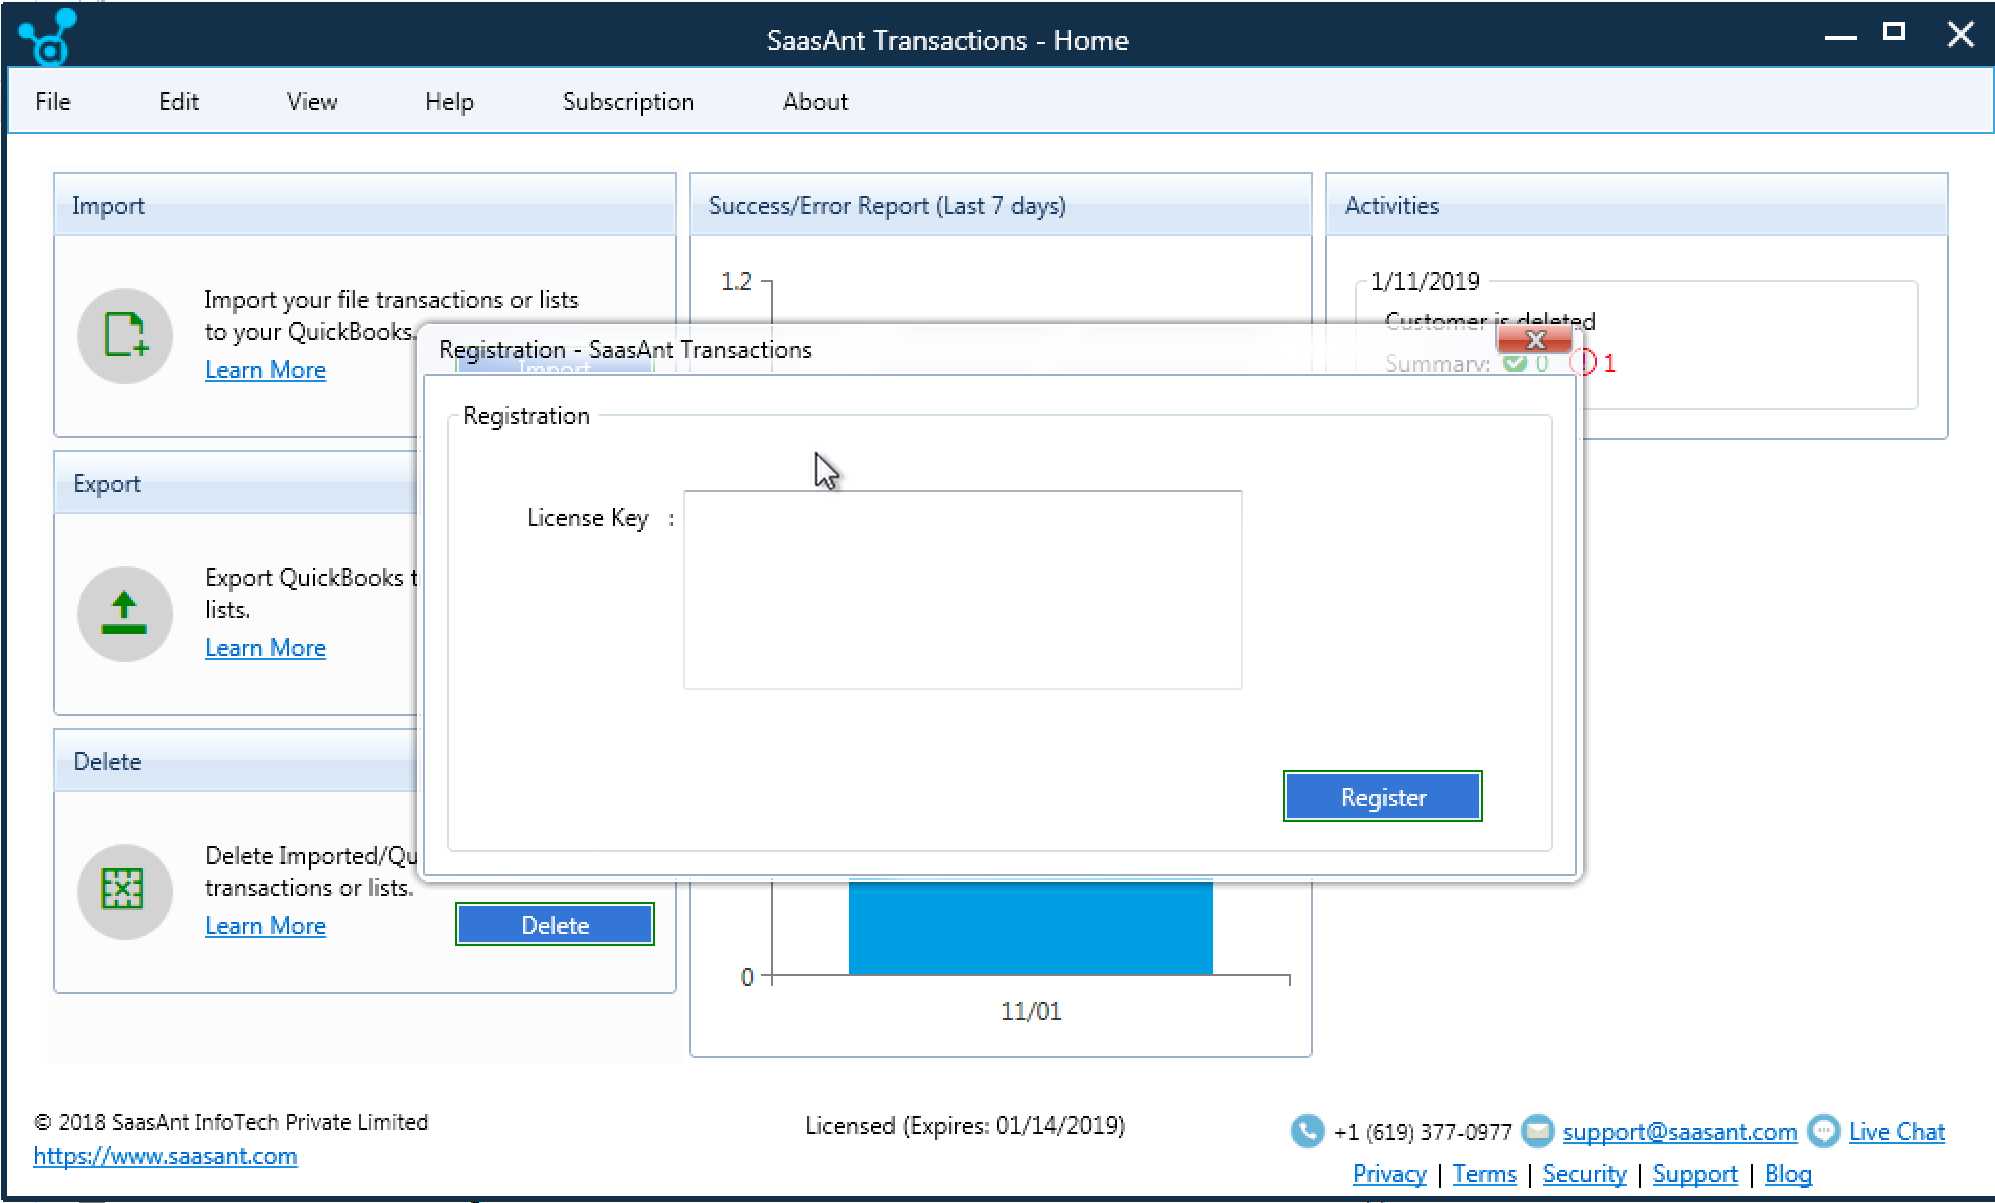 Activation of SaasAnt Transactions (Desktop)